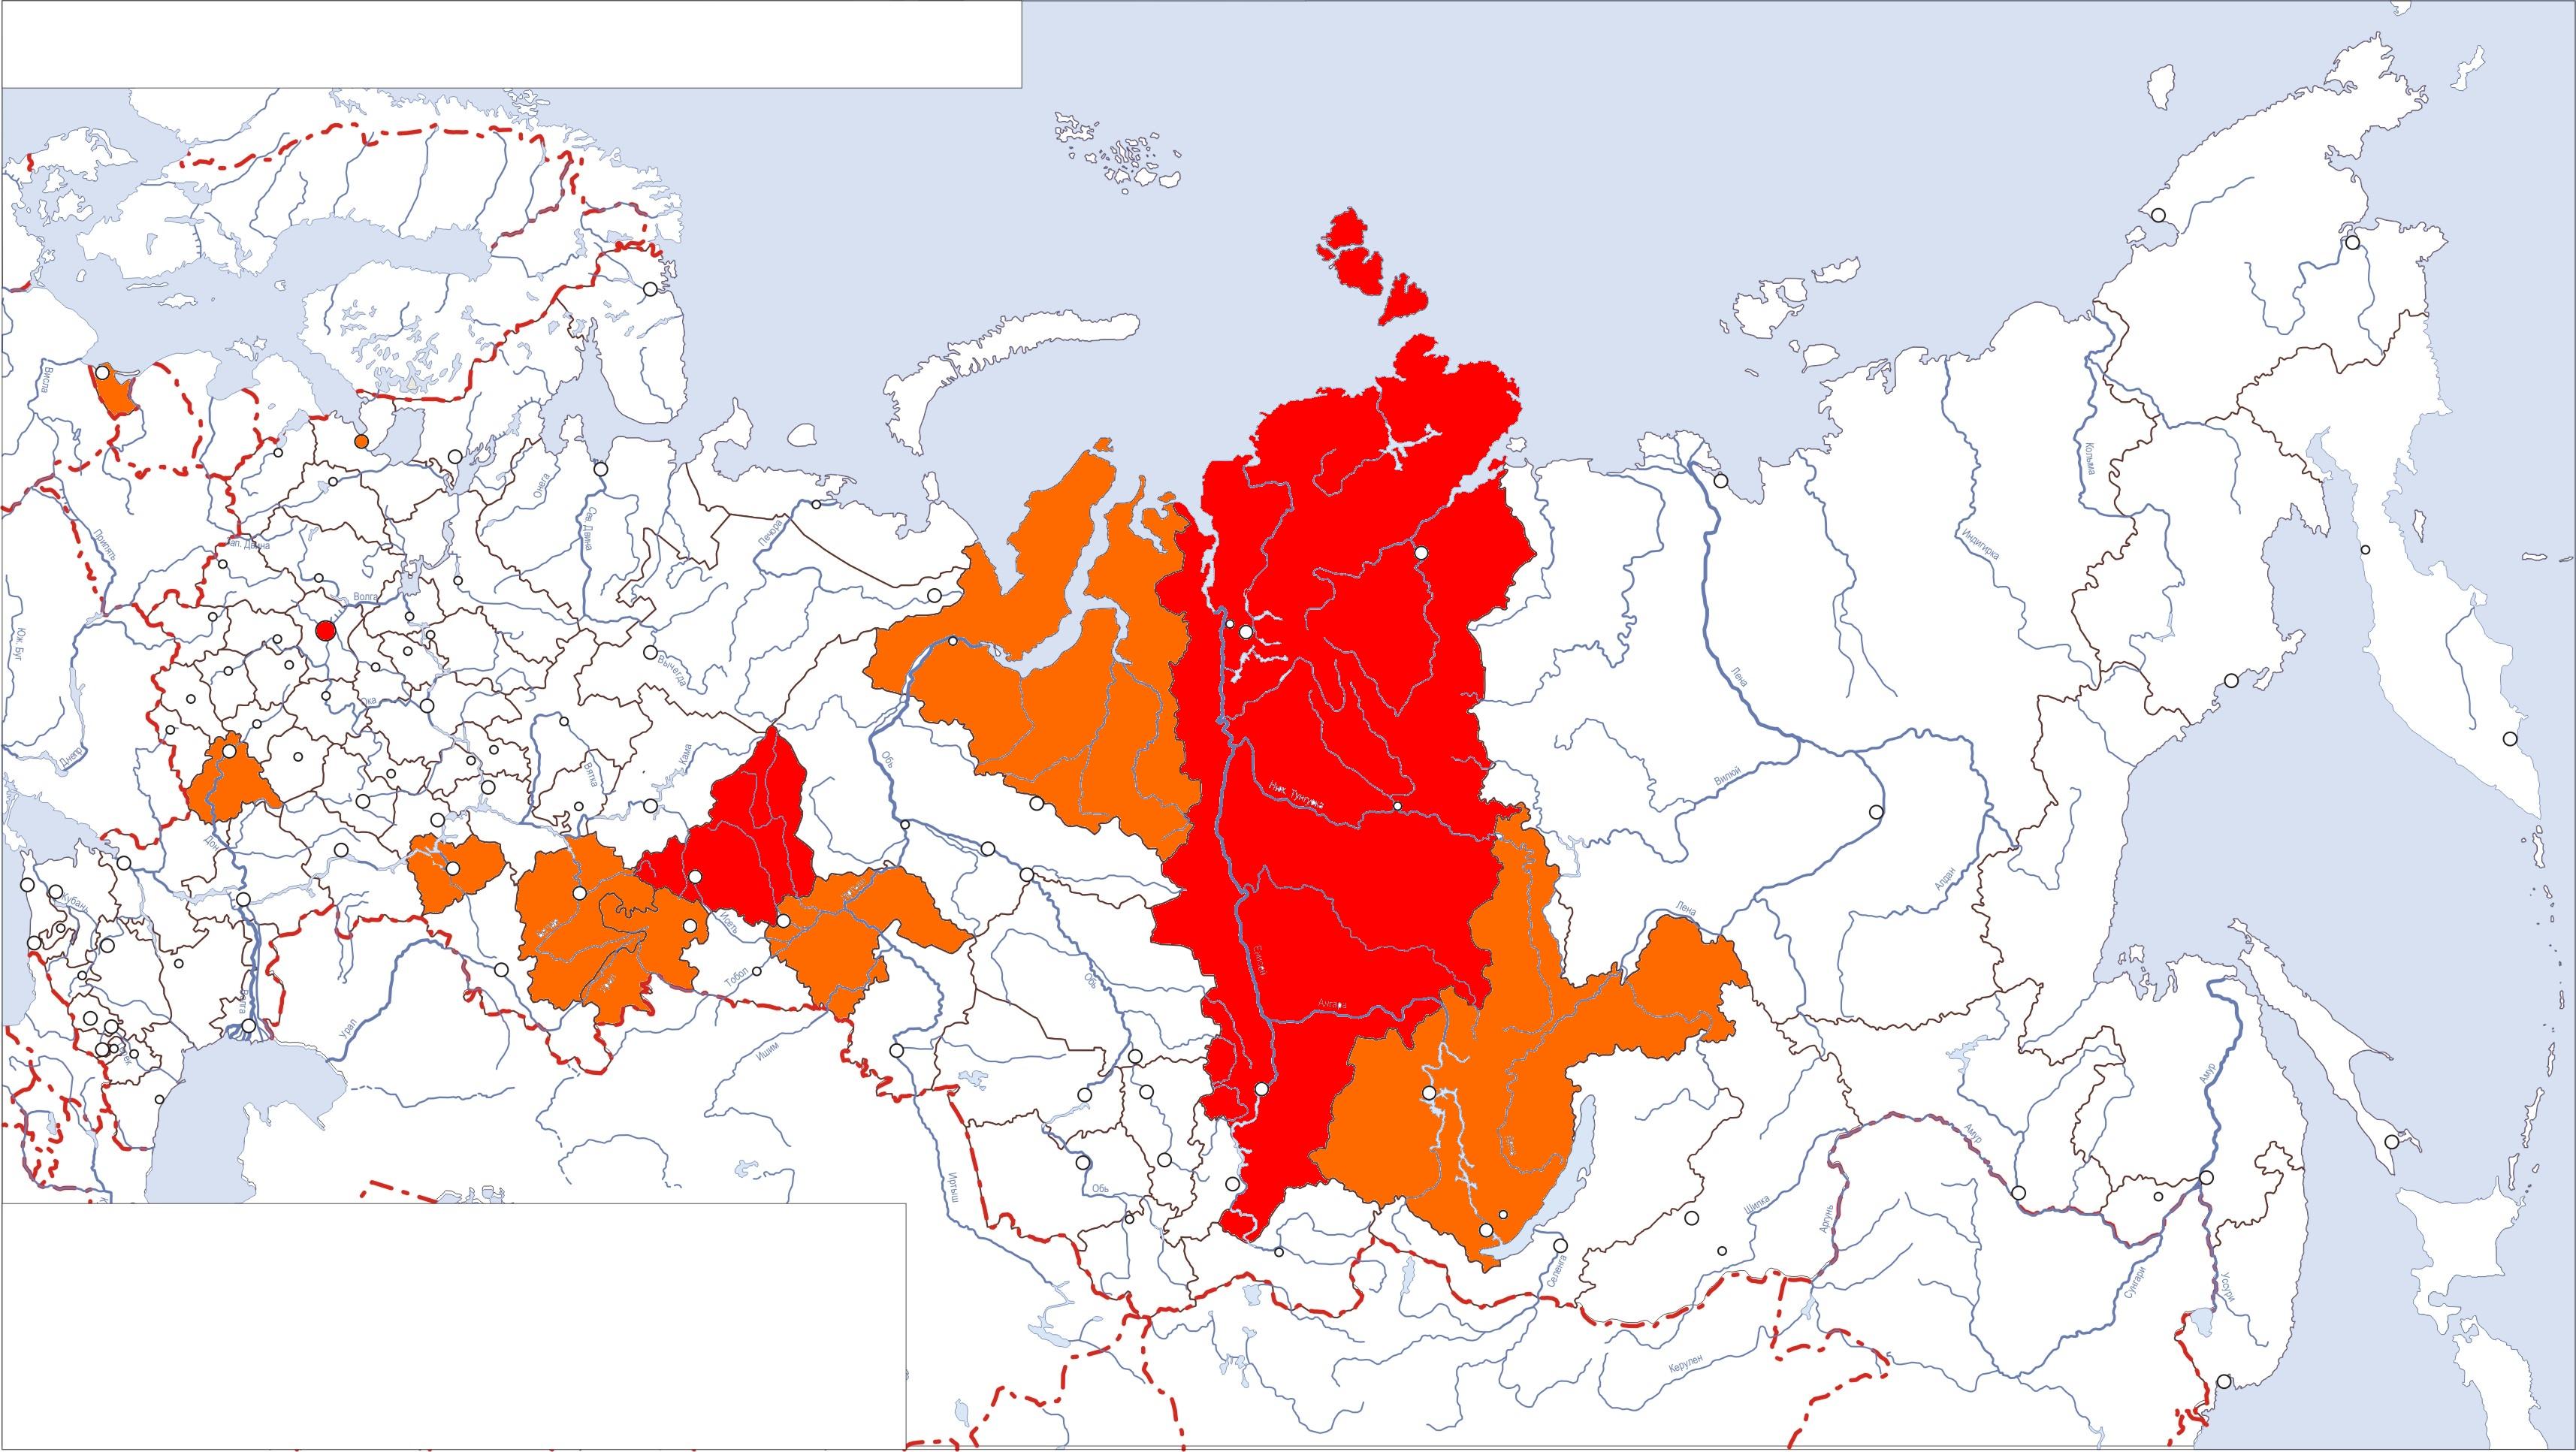 File:Контурная карта России с регионами Сборная 2009.jpg ...: http://commons.wikimedia.org/wiki/File:%D0%9A%D0%BE%D0%BD%D1%82%D1%83%D1%80%D0%BD%D0%B0%D1%8F_%D0%BA%D0%B0%D1%80%D1%82%D0%B0_%D0%A0%D0%BE%D1%81%D1%81%D0%B8%D0%B8_%D1%81_%D1%80%D0%B5%D0%B3%D0%B8%D0%BE%D0%BD%D0%B0%D0%BC%D0%B8_%D0%A1%D0%B1%D0%BE%D1%80%D0%BD%D0%B0%D1%8F_2009.jpg